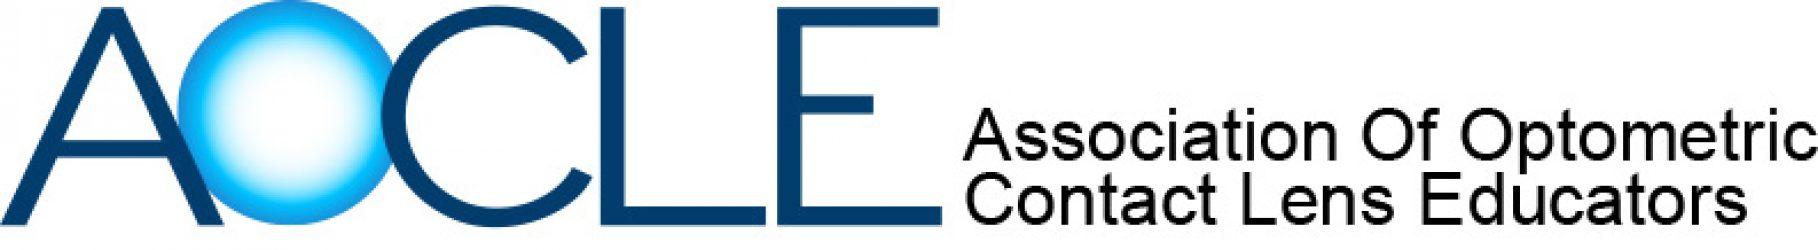 AOCLE – Association of Optometric Contact Lens Educators